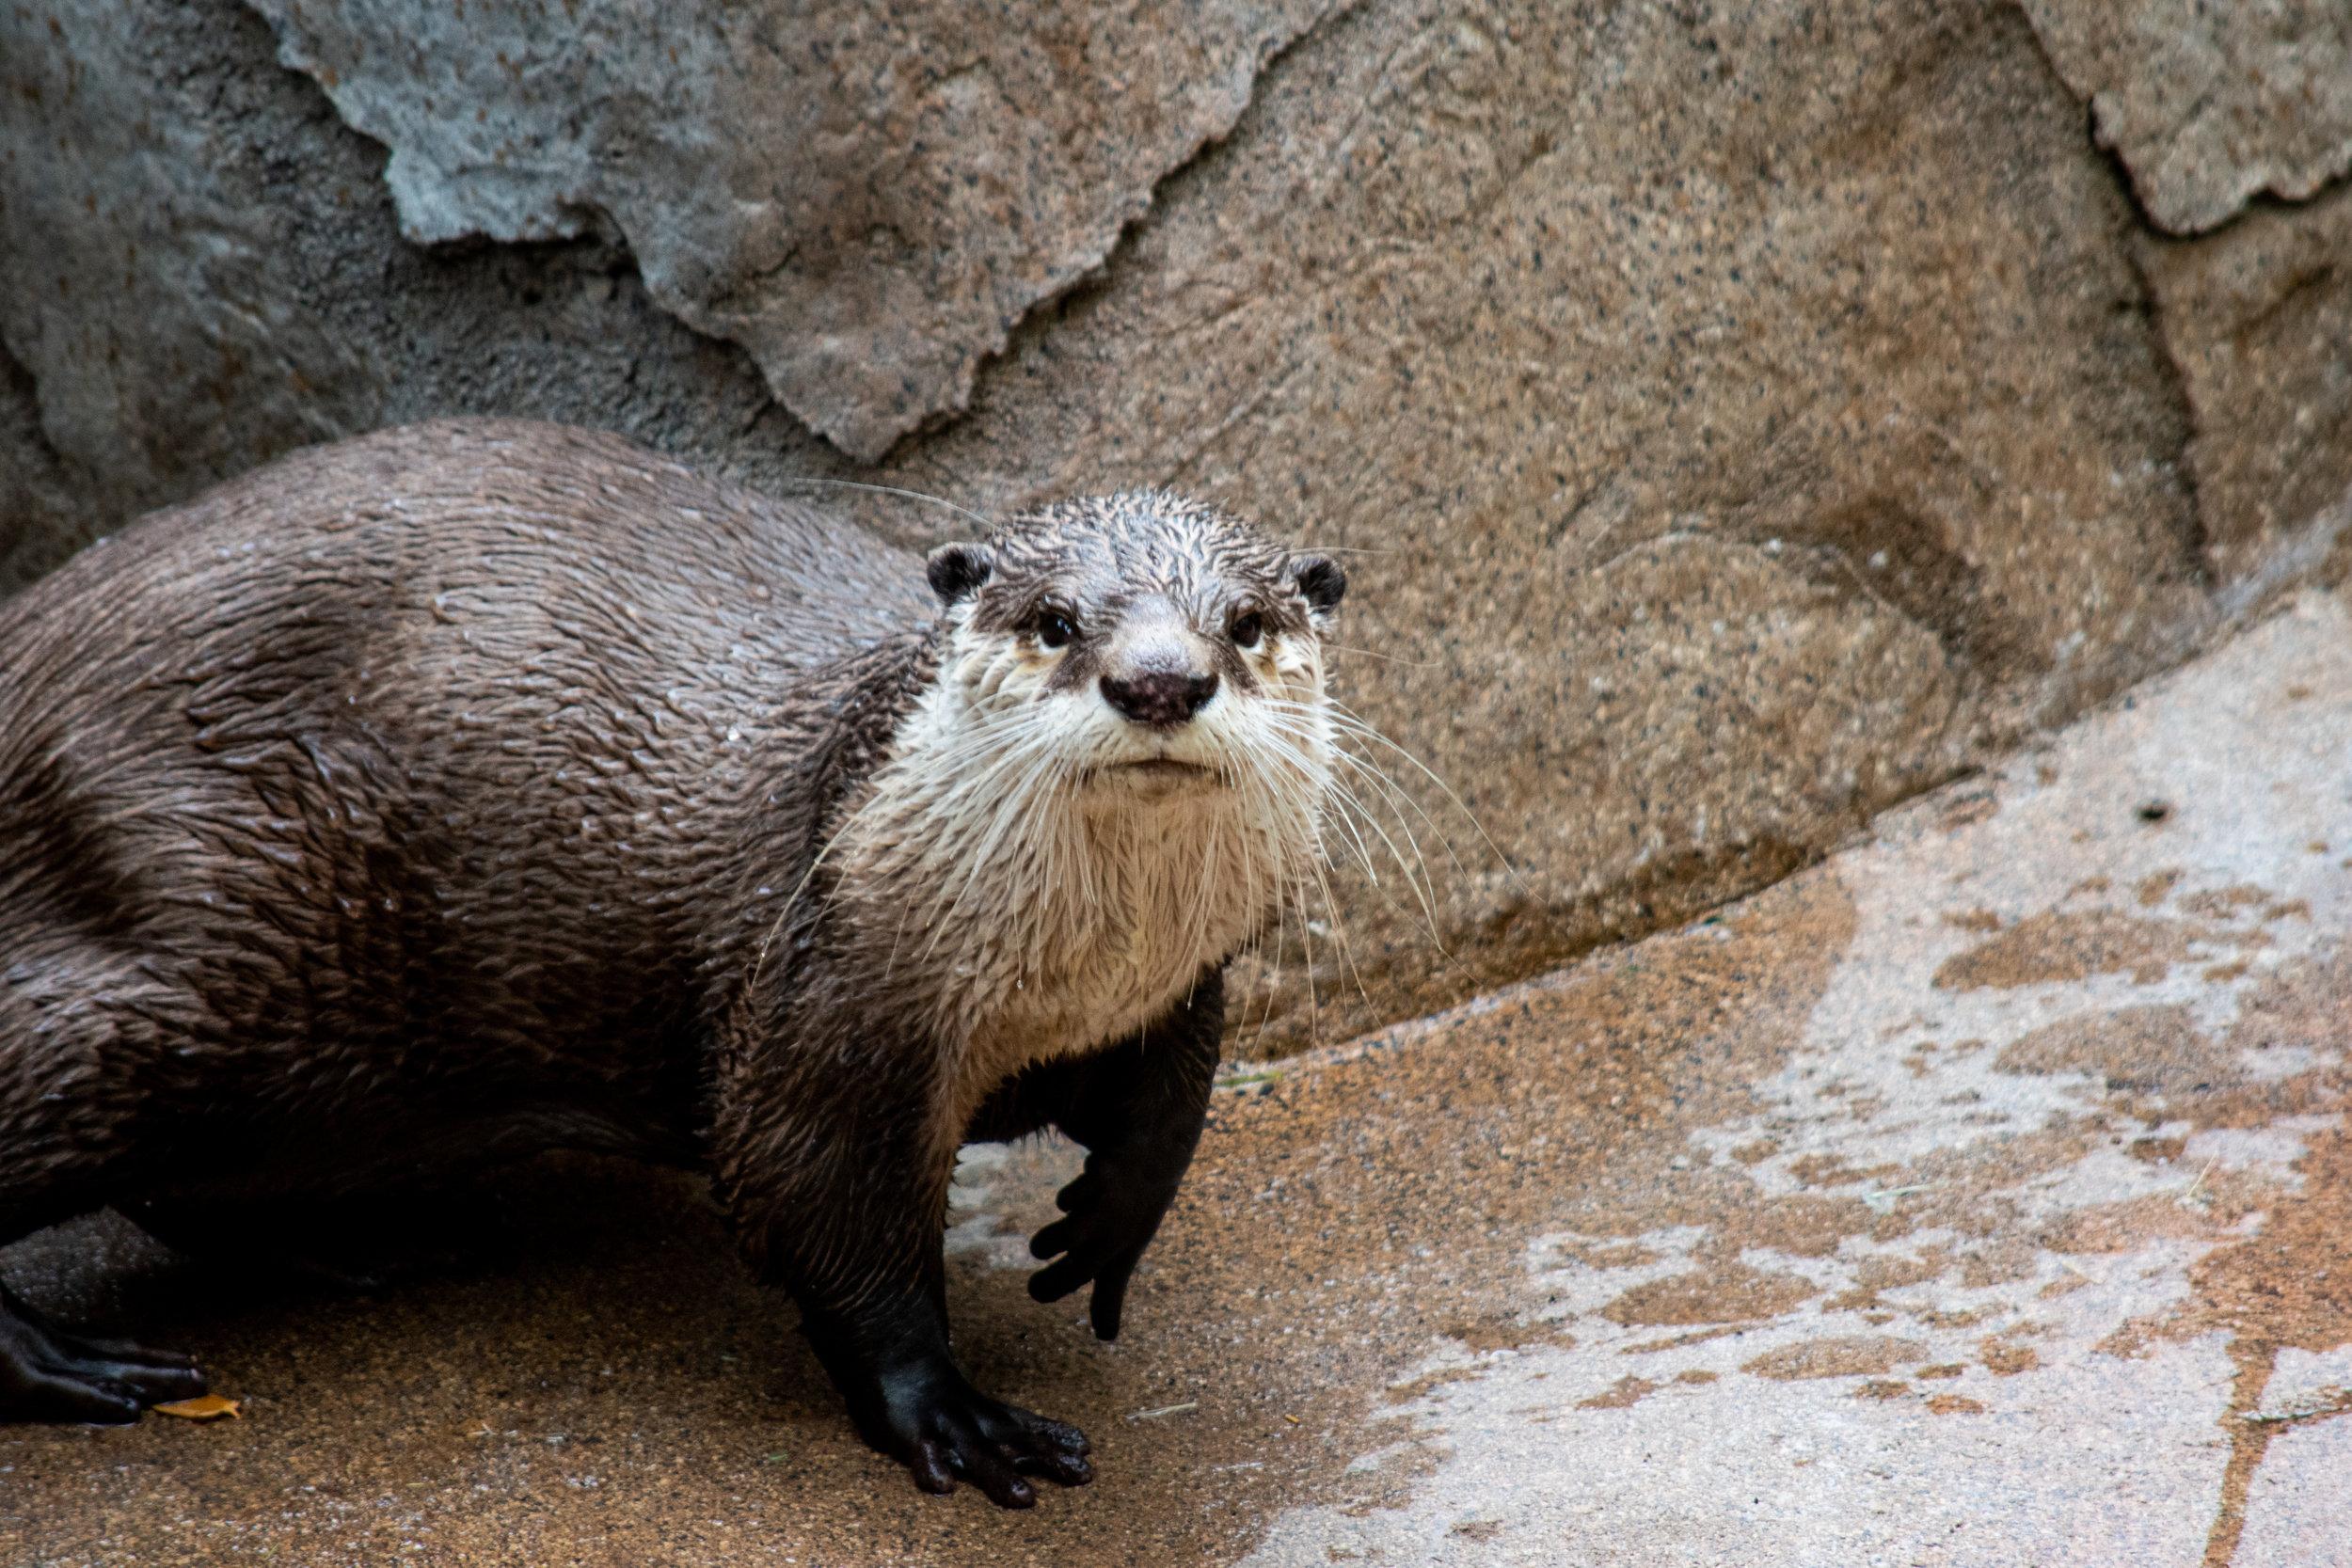 zoo 39 - otter staring.jpg